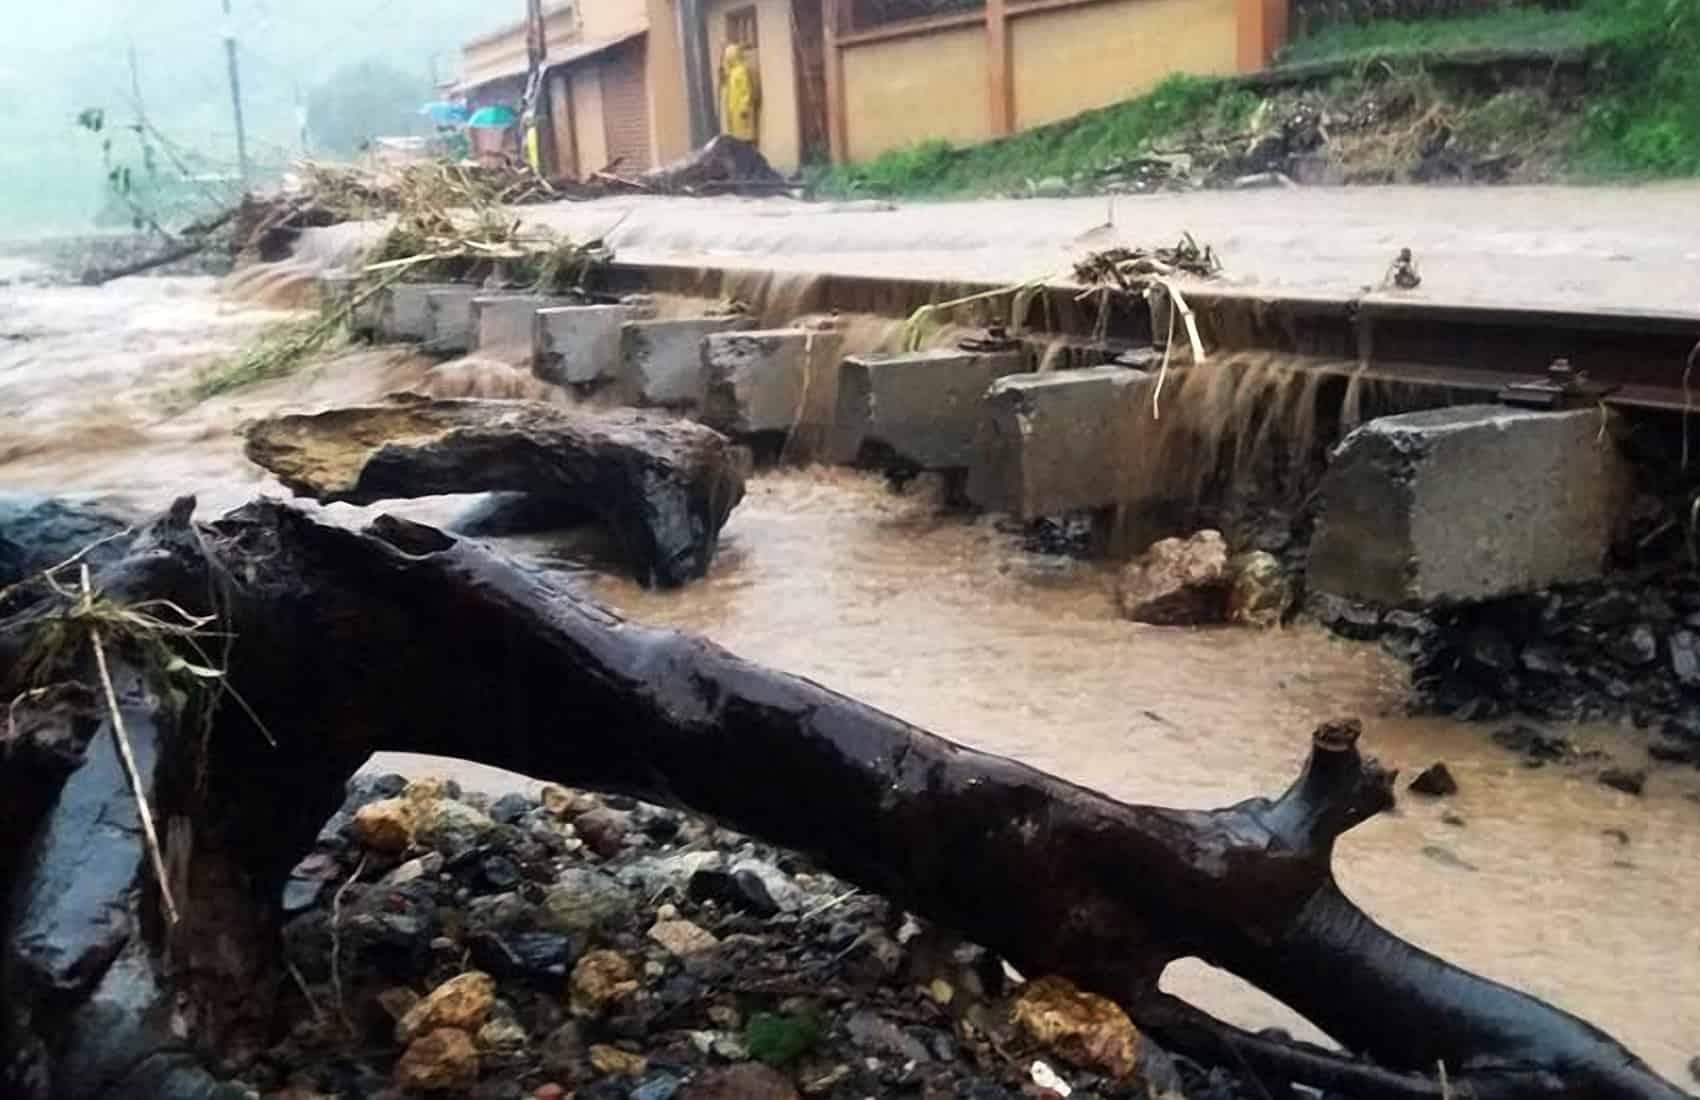 Heavy rains, flooding in Cartago. Oct. 6, 2016.